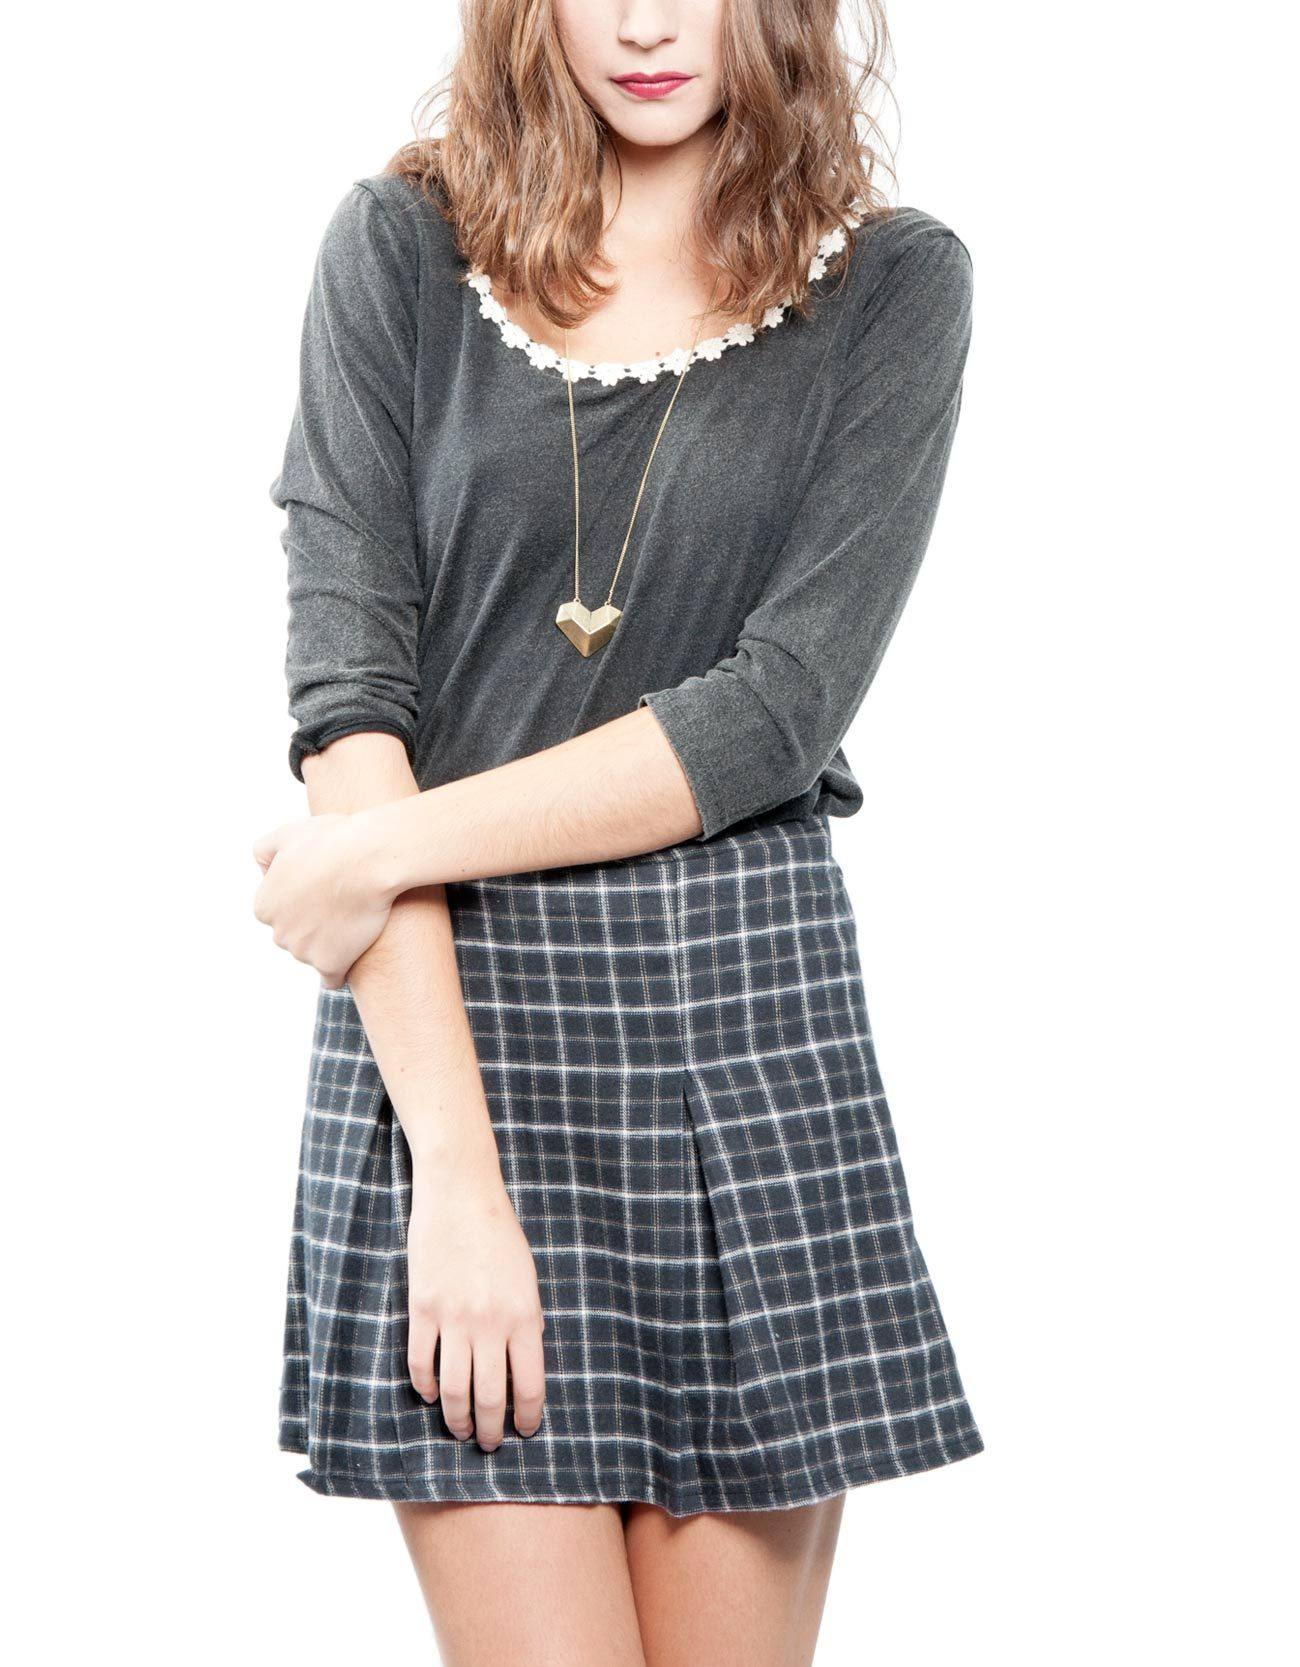 Camiseta manga 3/4 escote crochet Double Agent 19,99€ www.doubleagent.es  #fashion #trends #clothes